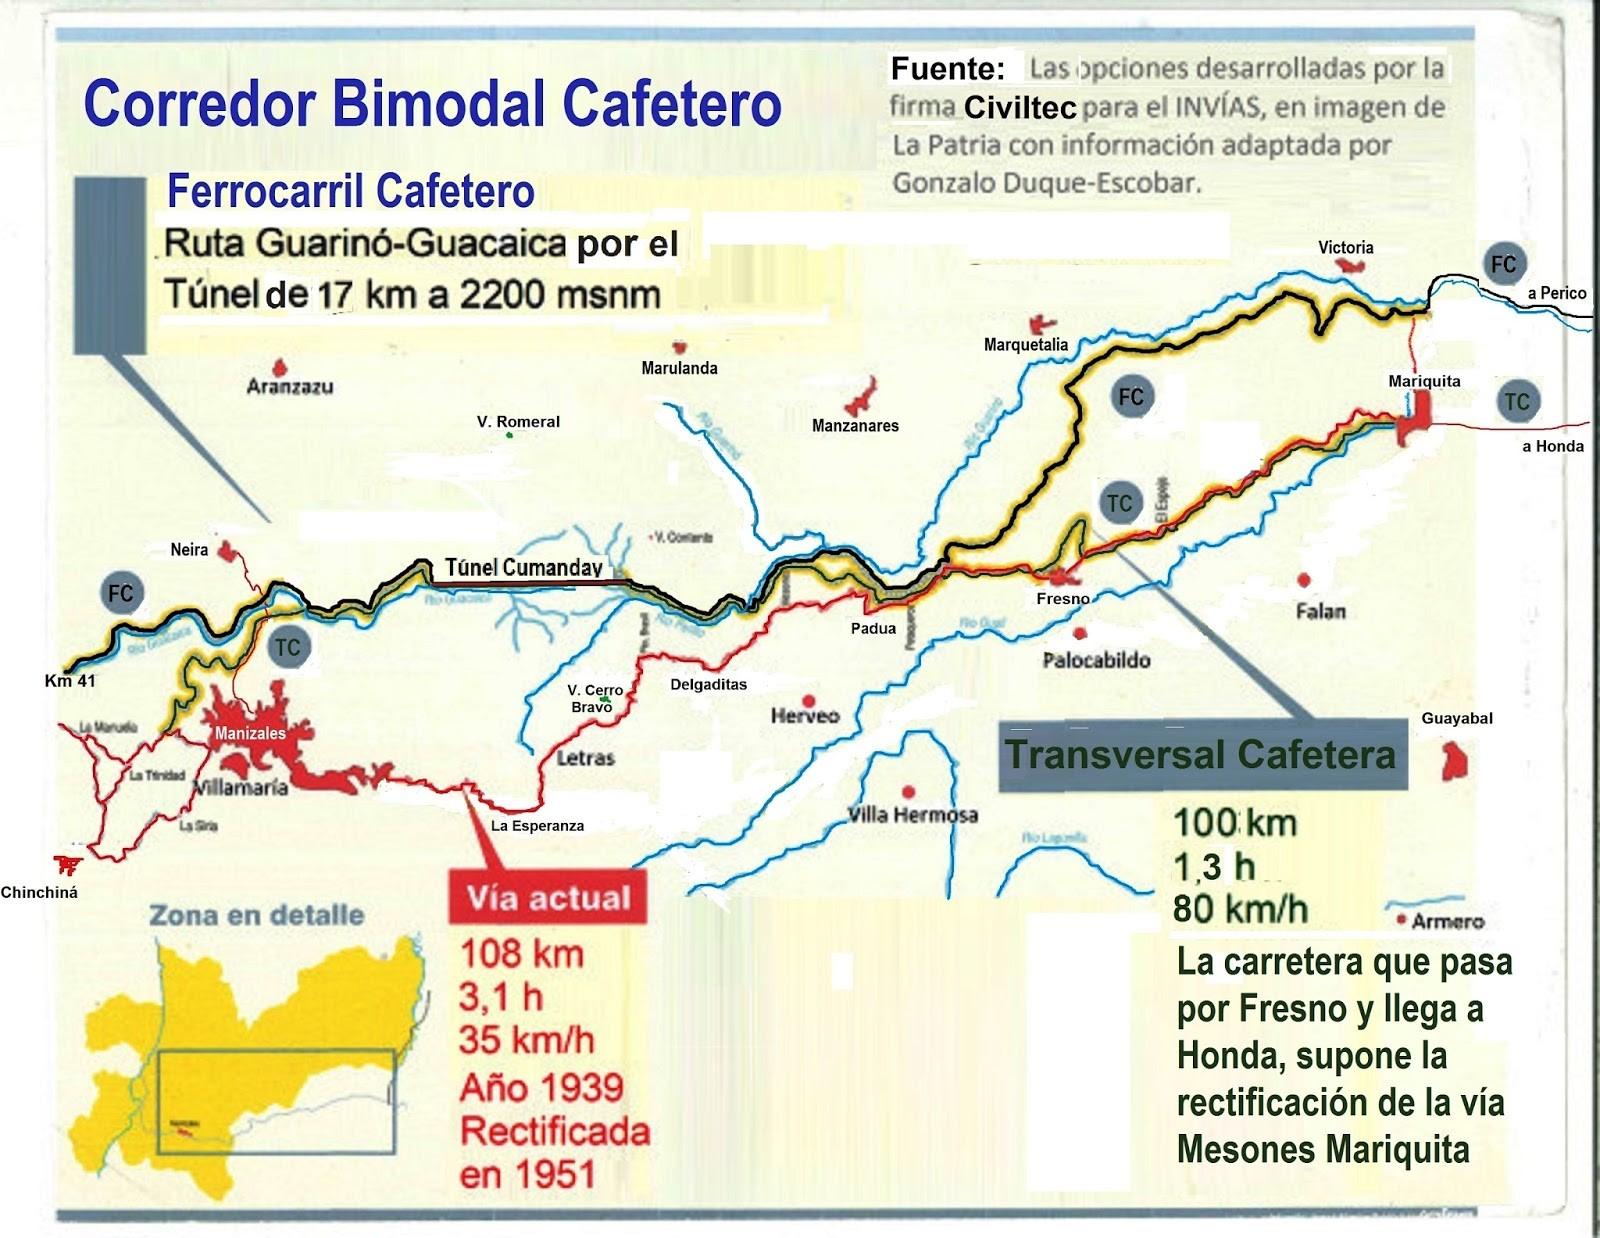 Ferrocarril Cafetero Imagen de contraportada